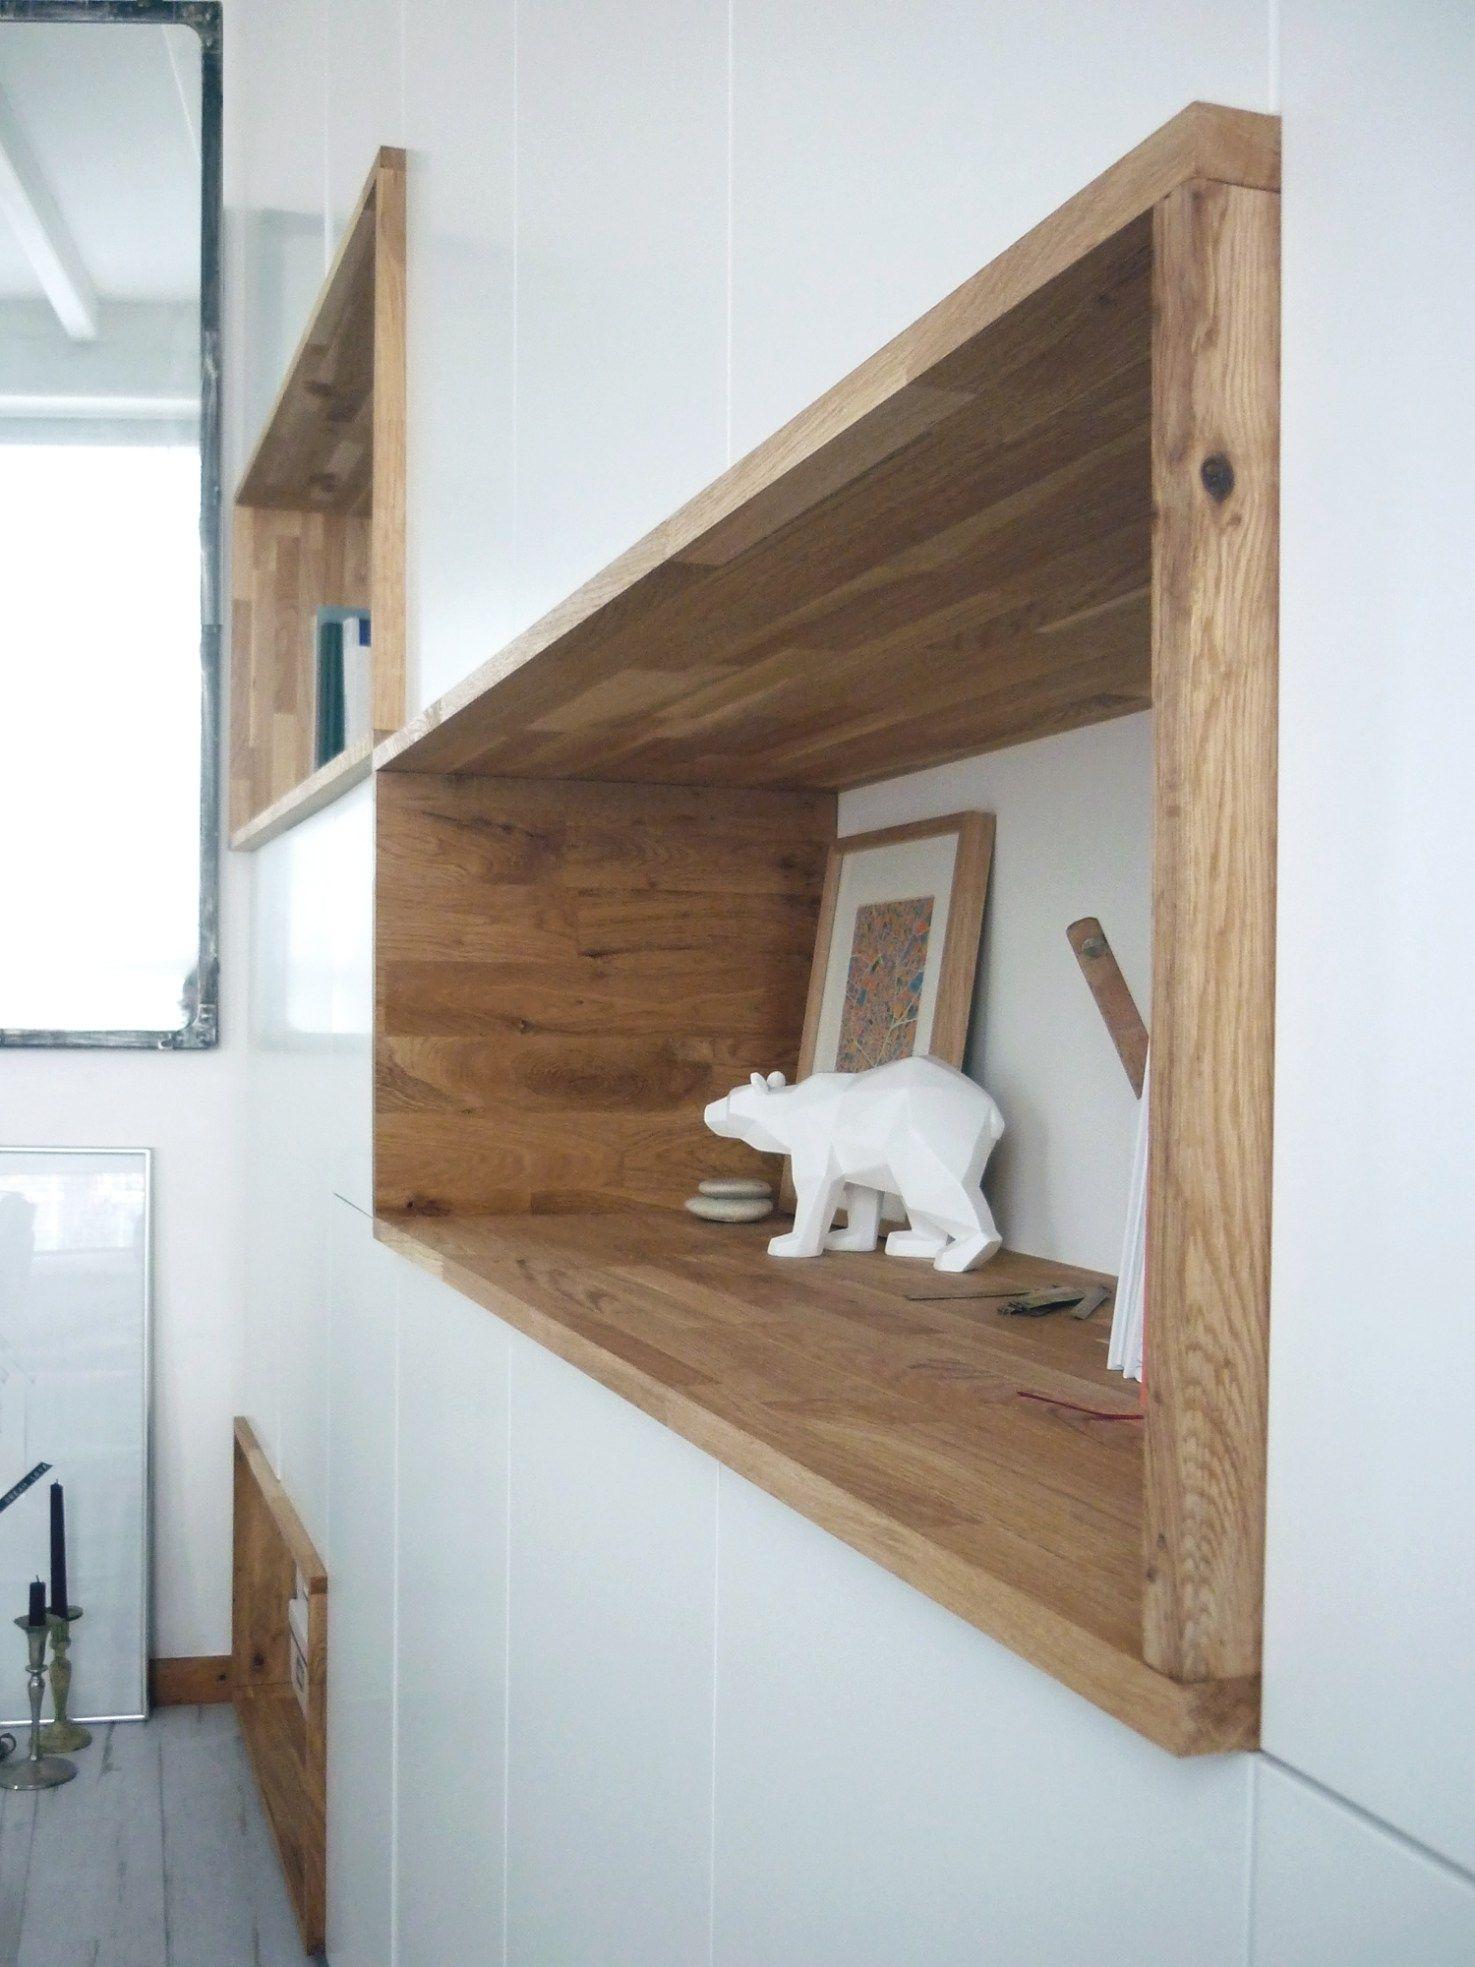 mur rangements blanc bois scandinave | Idee deco | Pinterest ...